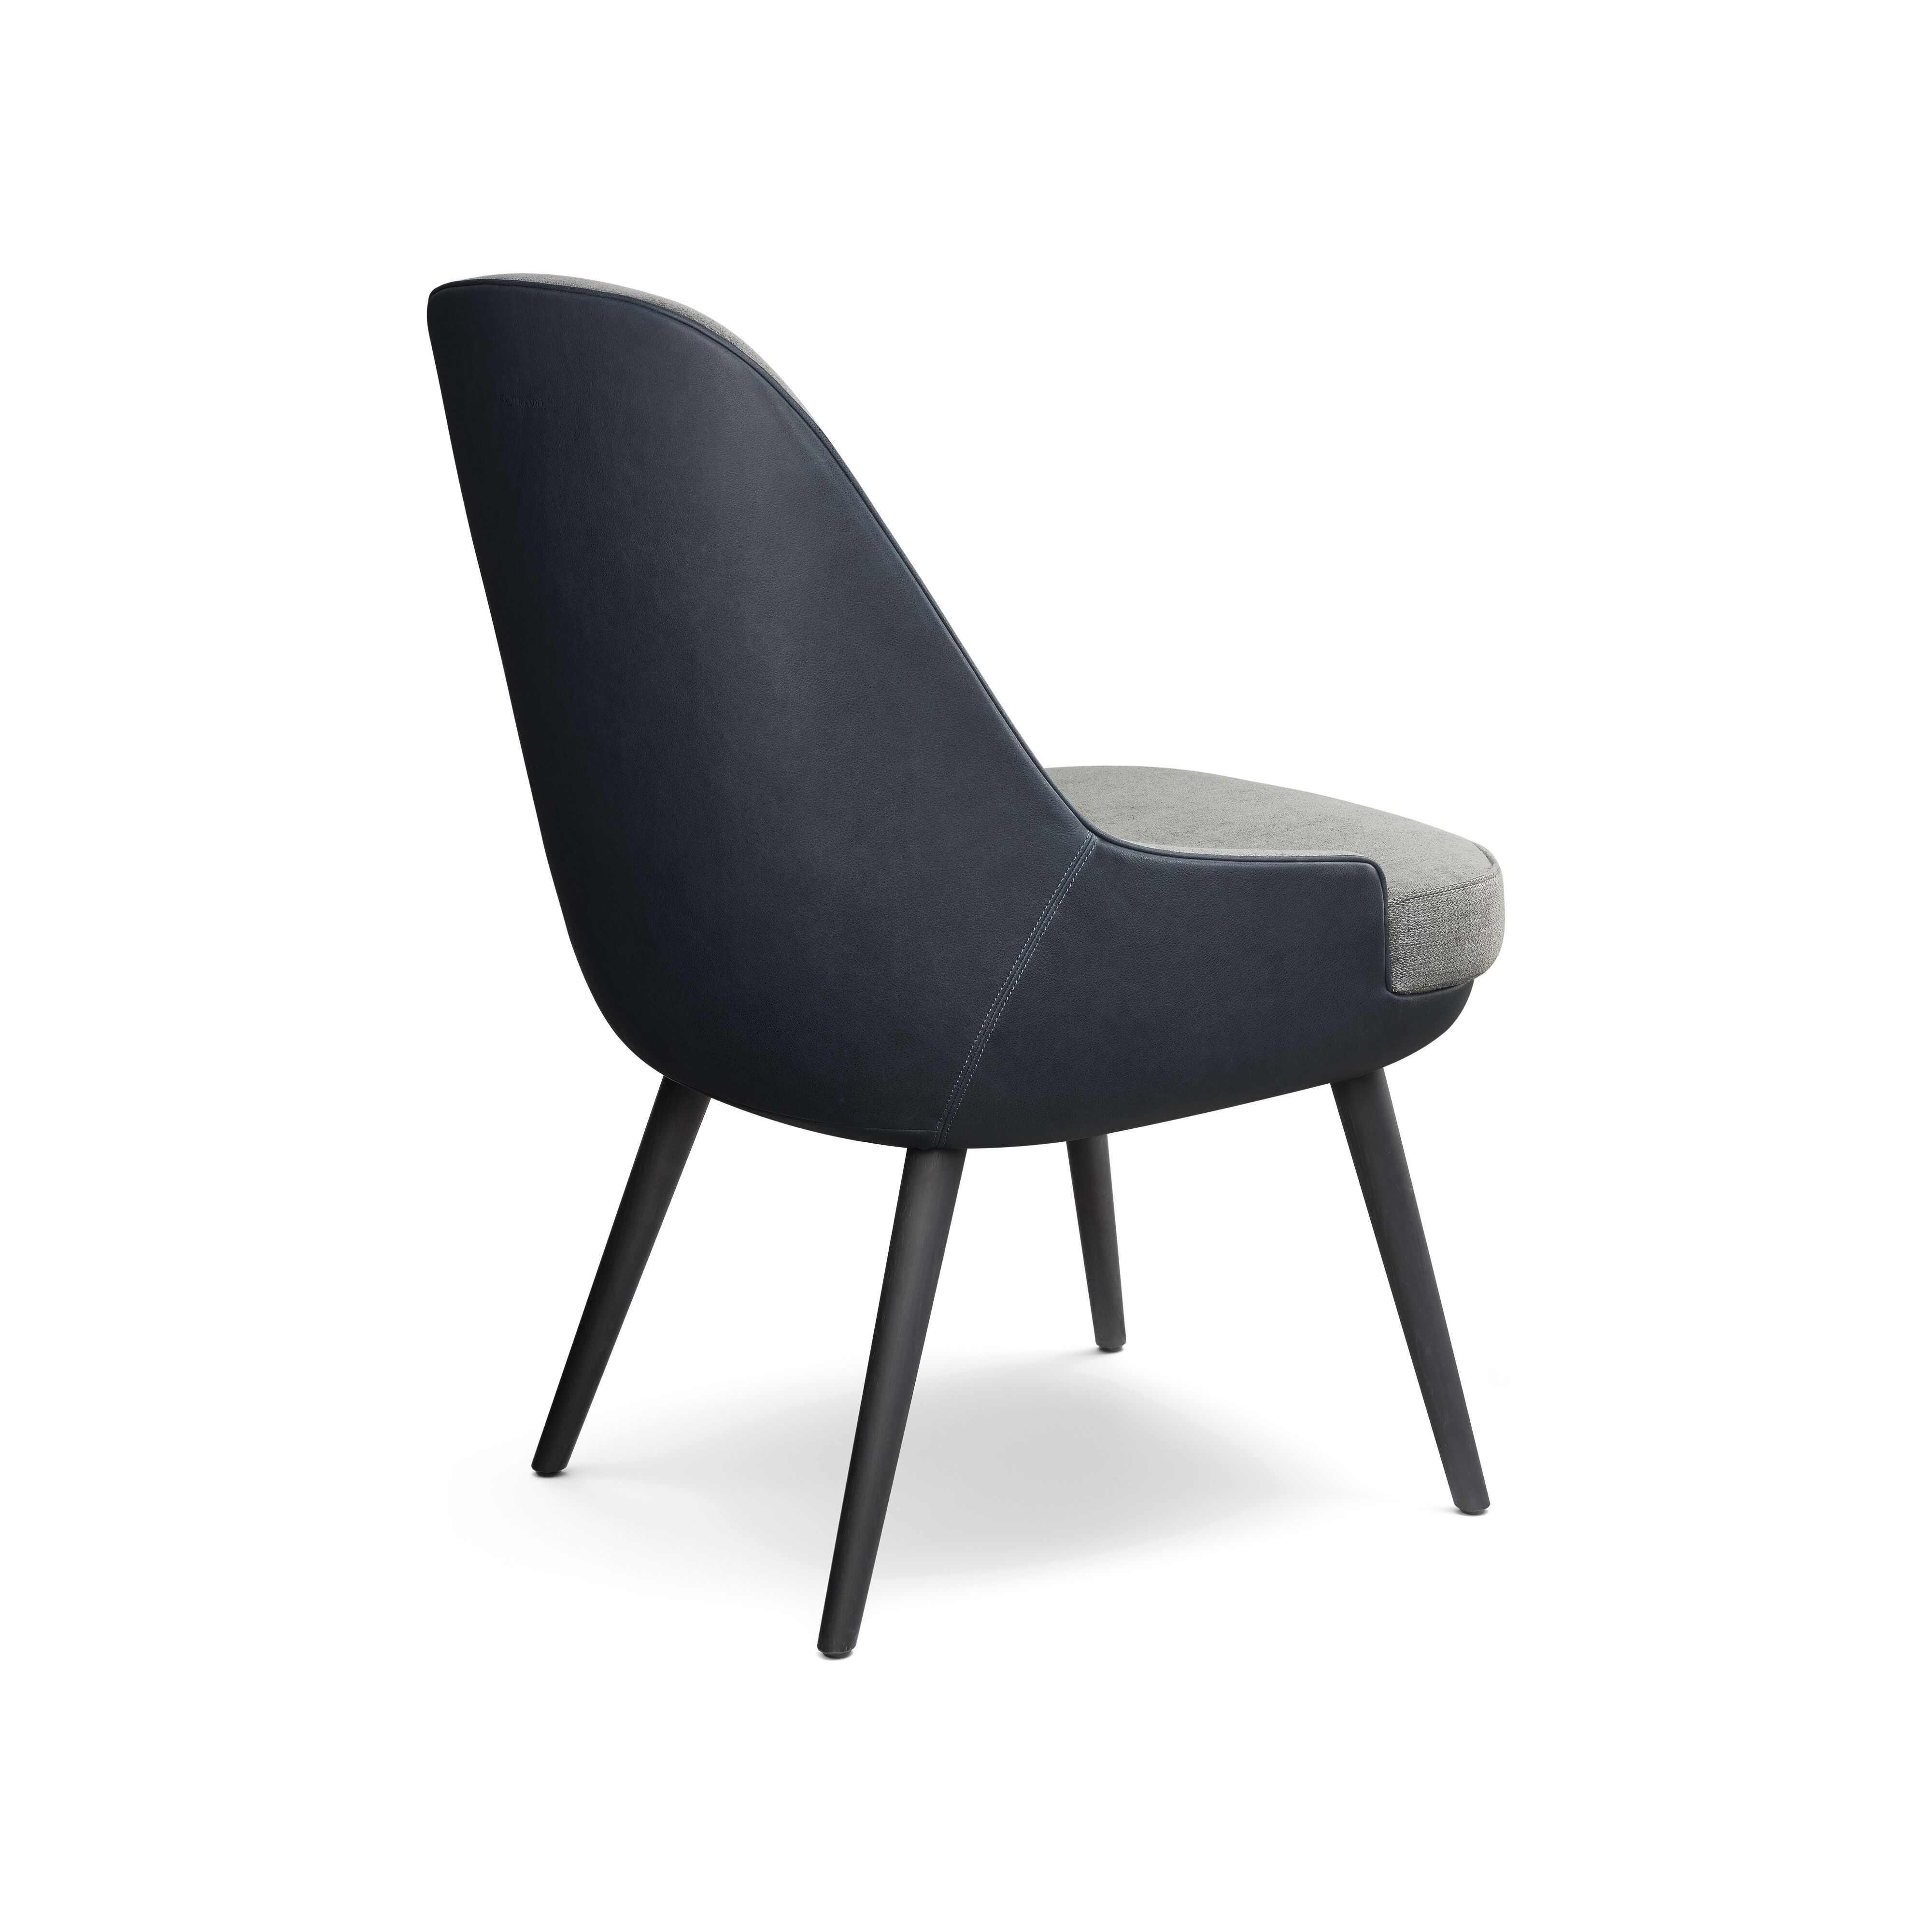 11_WK-375_Chair-Modell-1375-C-0005-H.tif